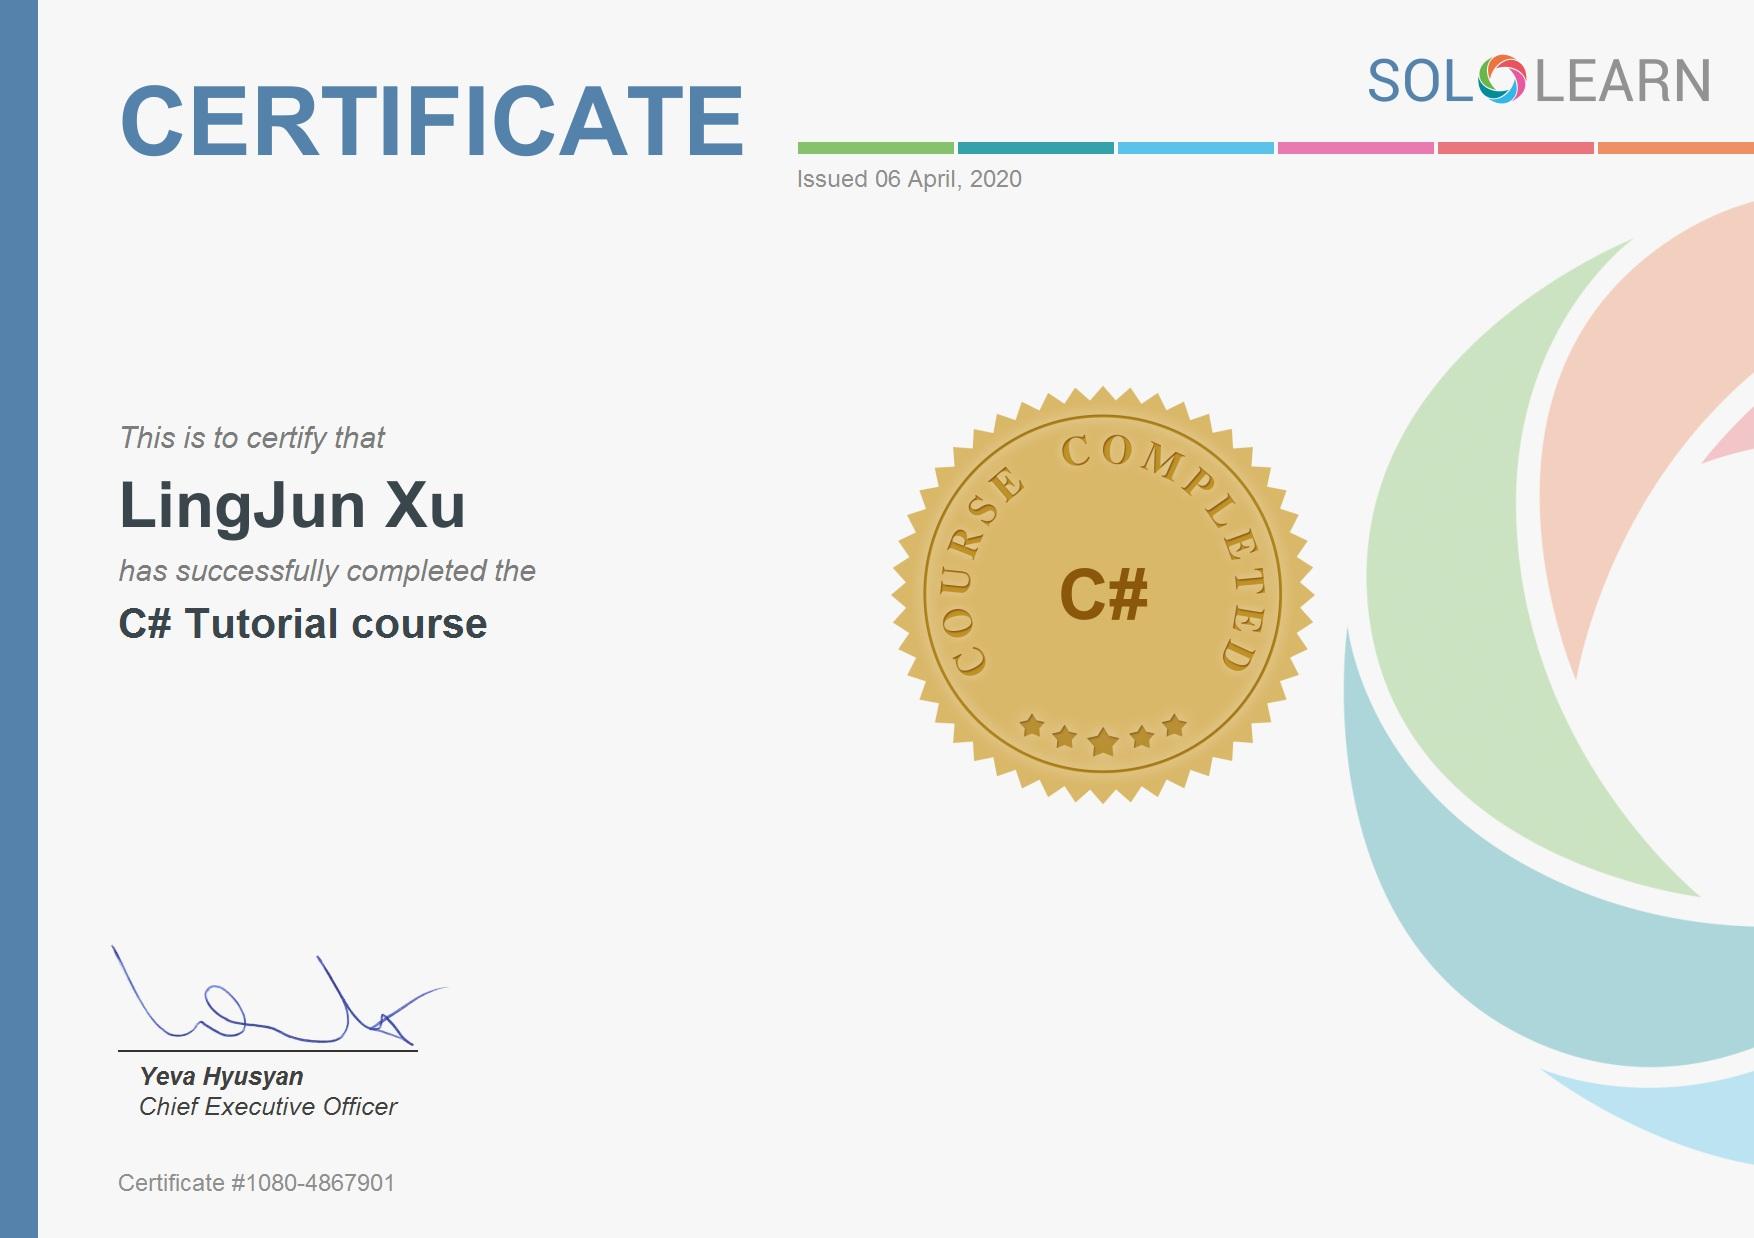 C# 基础课程的完成